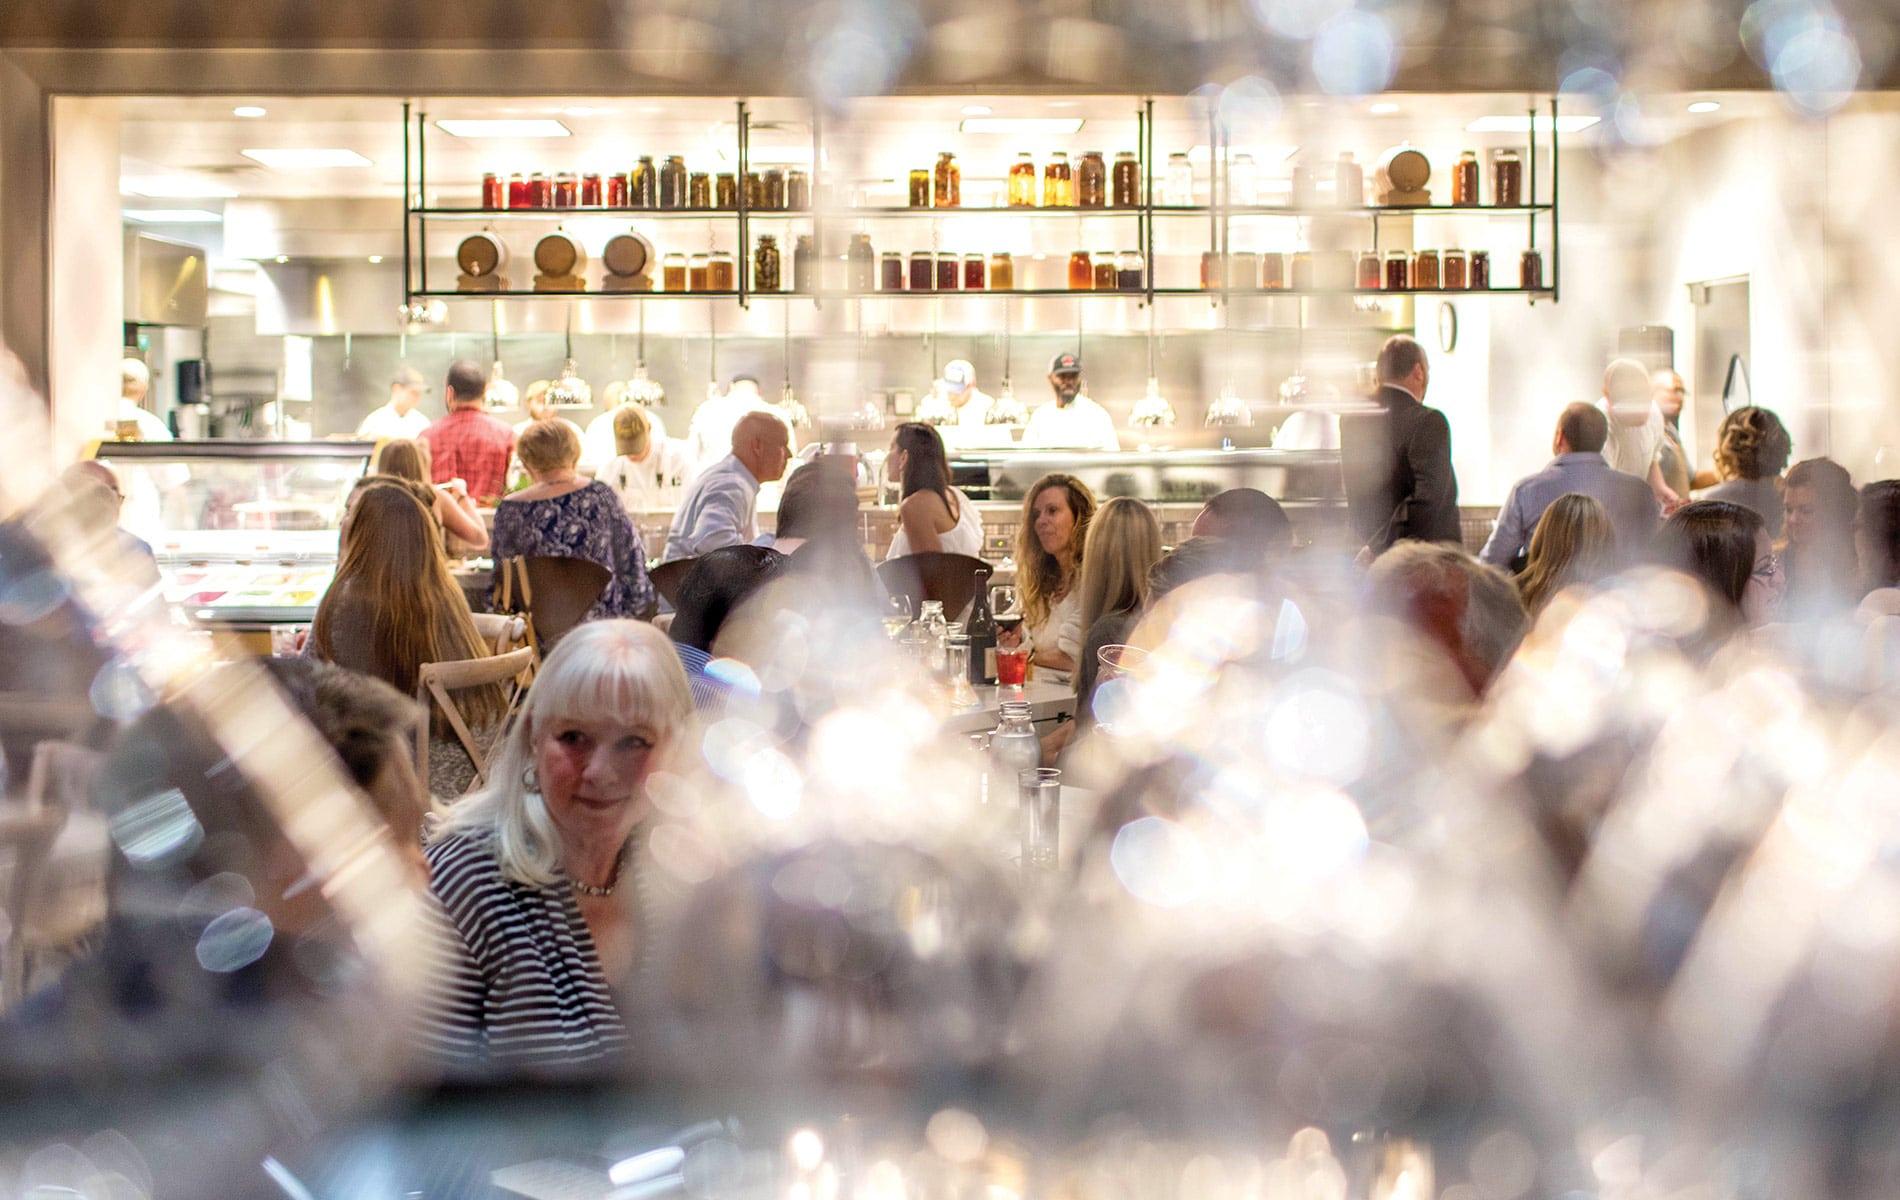 Looking through wine glasses at the dinning room area at Emeril's Coastal Italian at Grand Boulevard in Miramar Beach, Florida